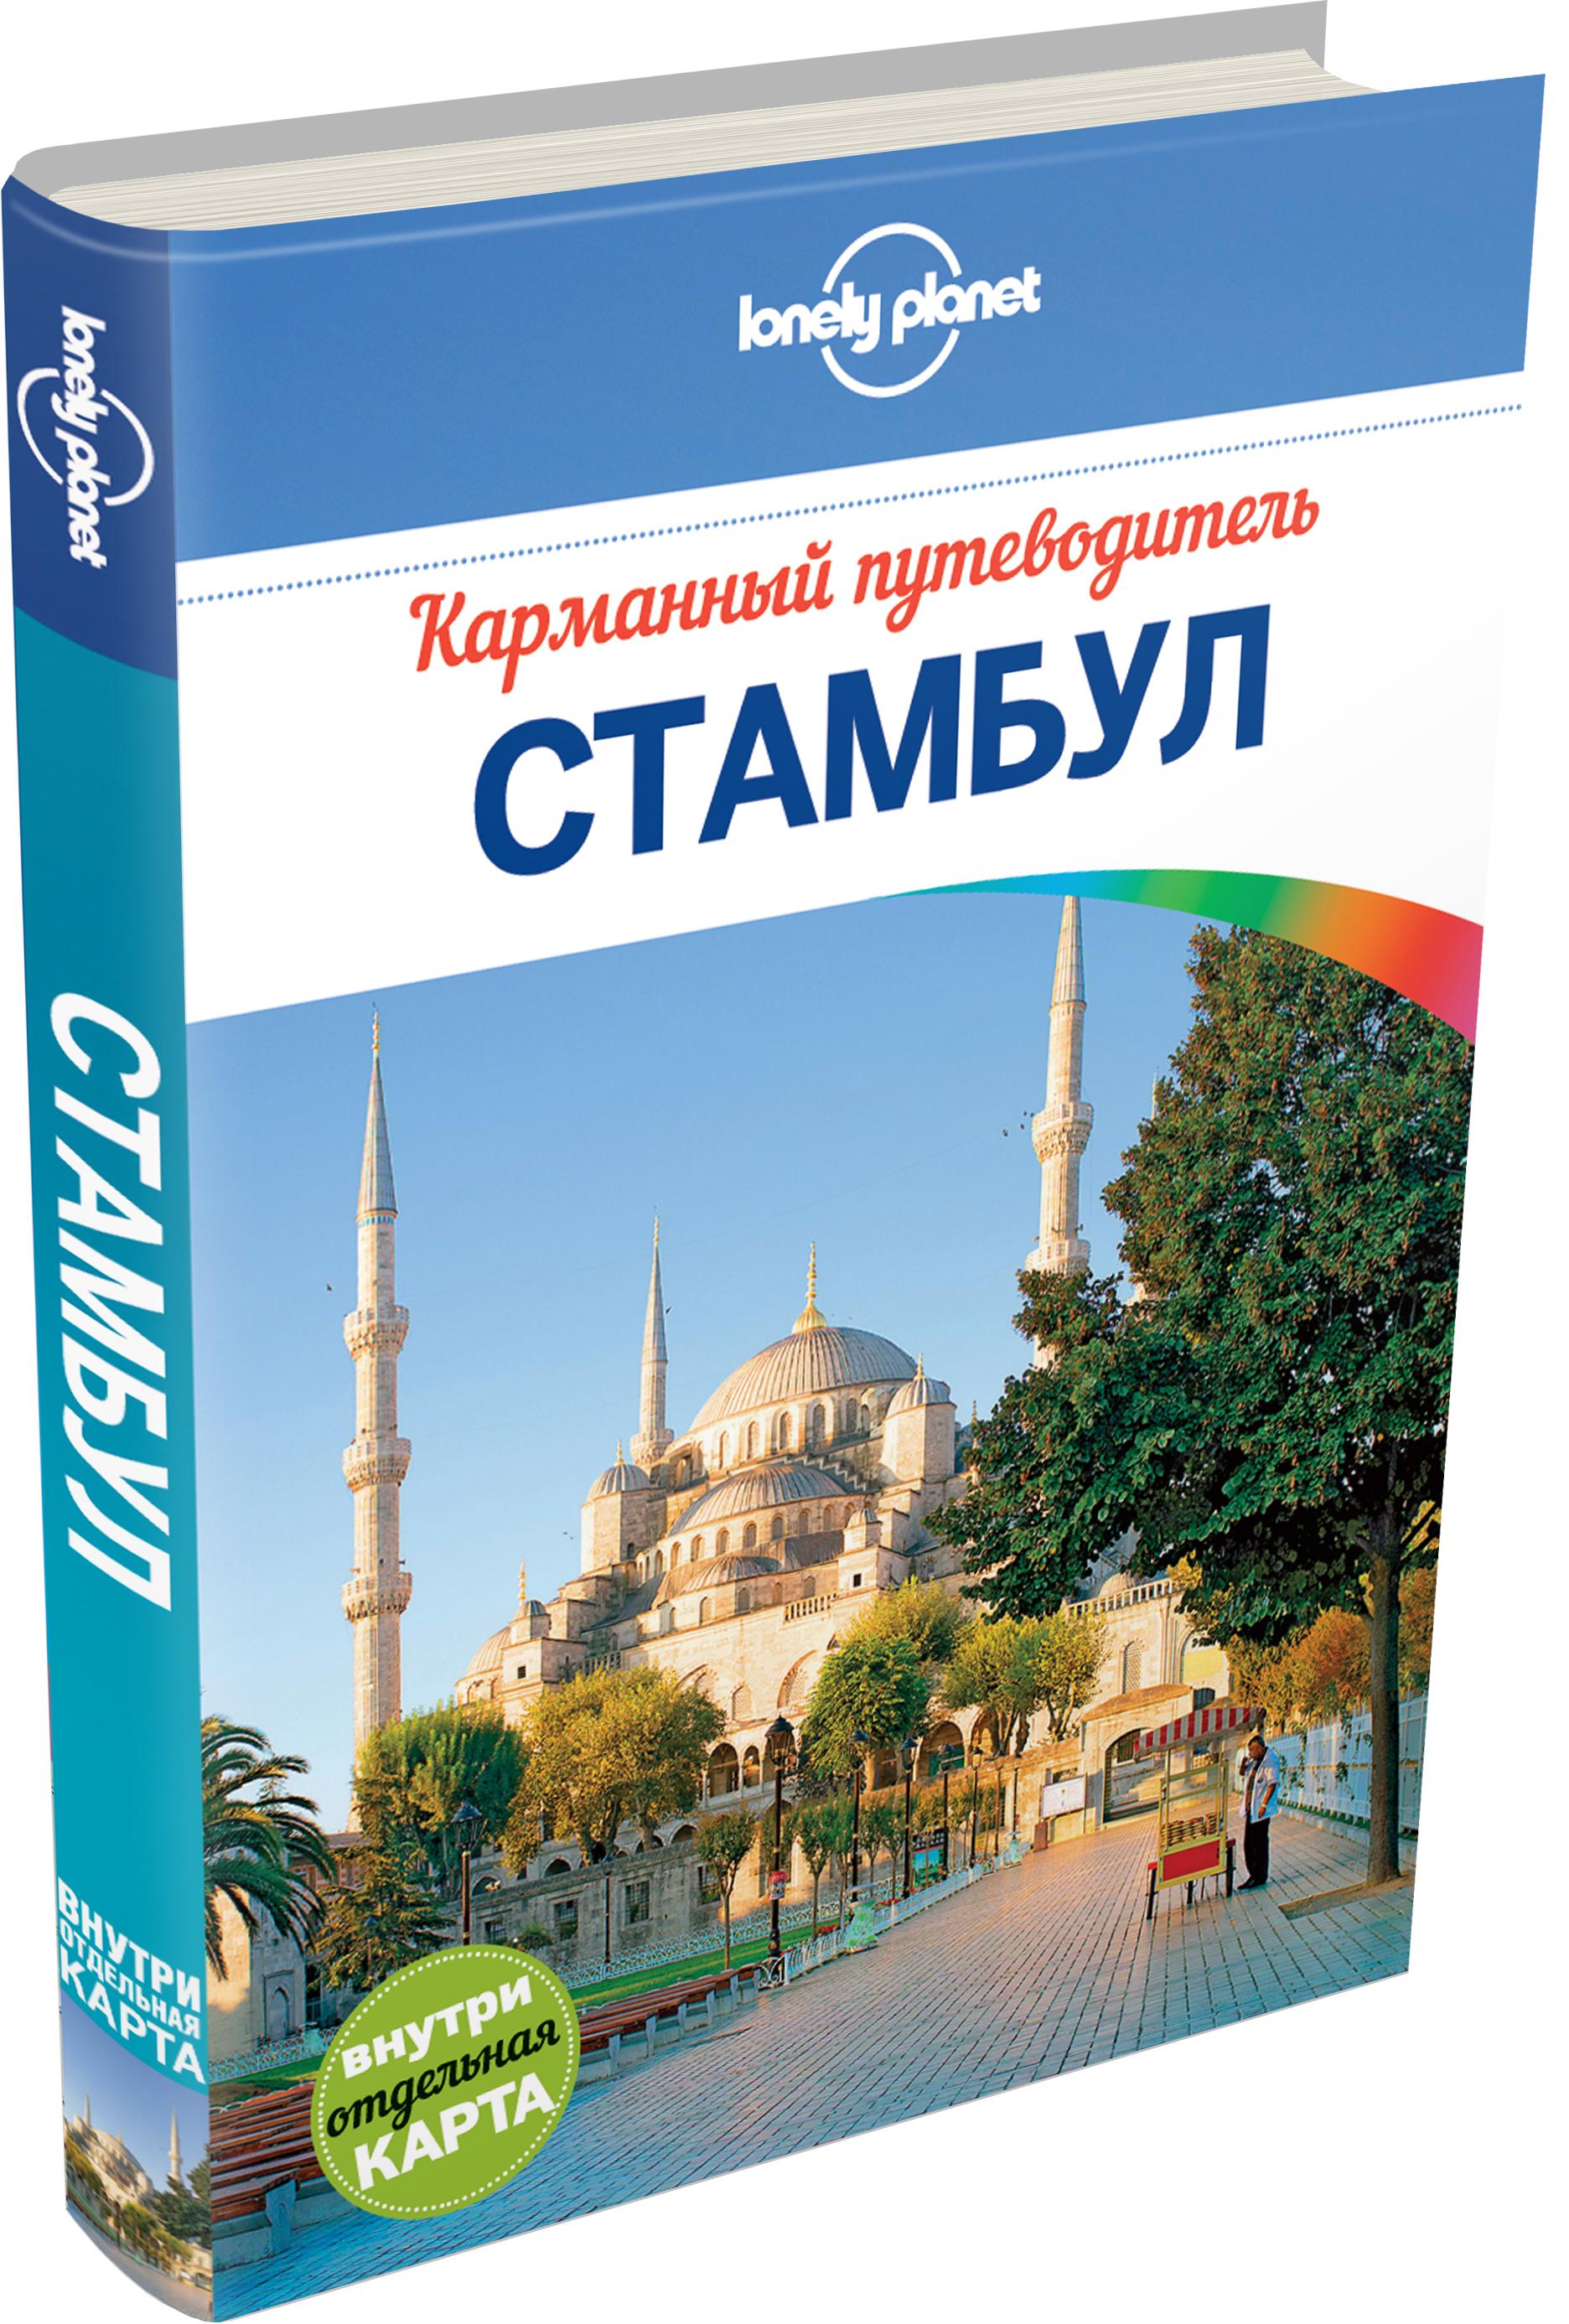 Стамбул turvan 3 стамбул